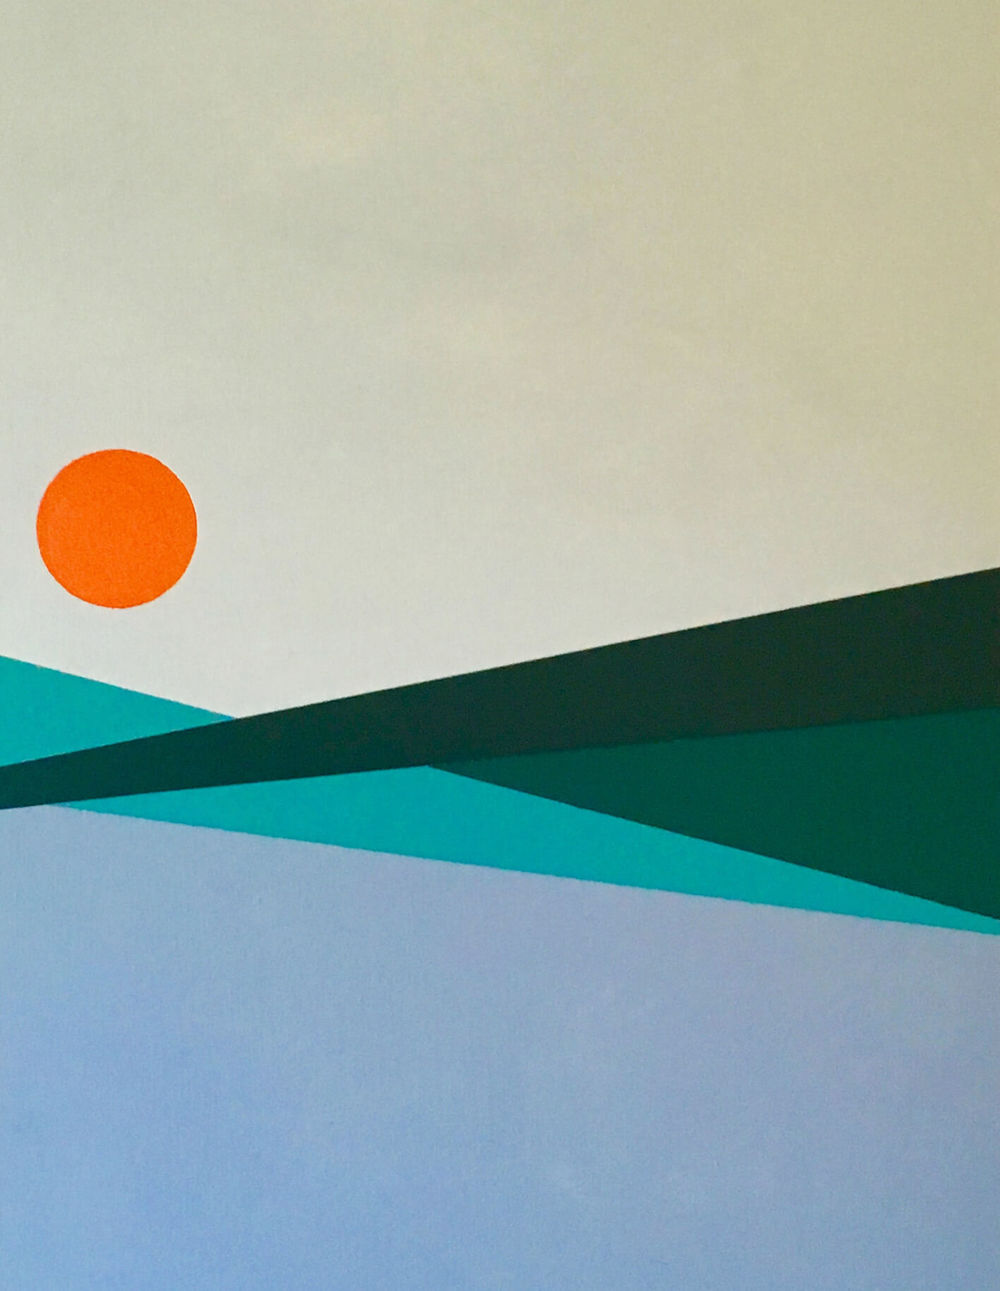 Minimal 3, 70 cm x 50 x 4 cm, Acryl auf Leinwand, 2016, 600,- Euro.